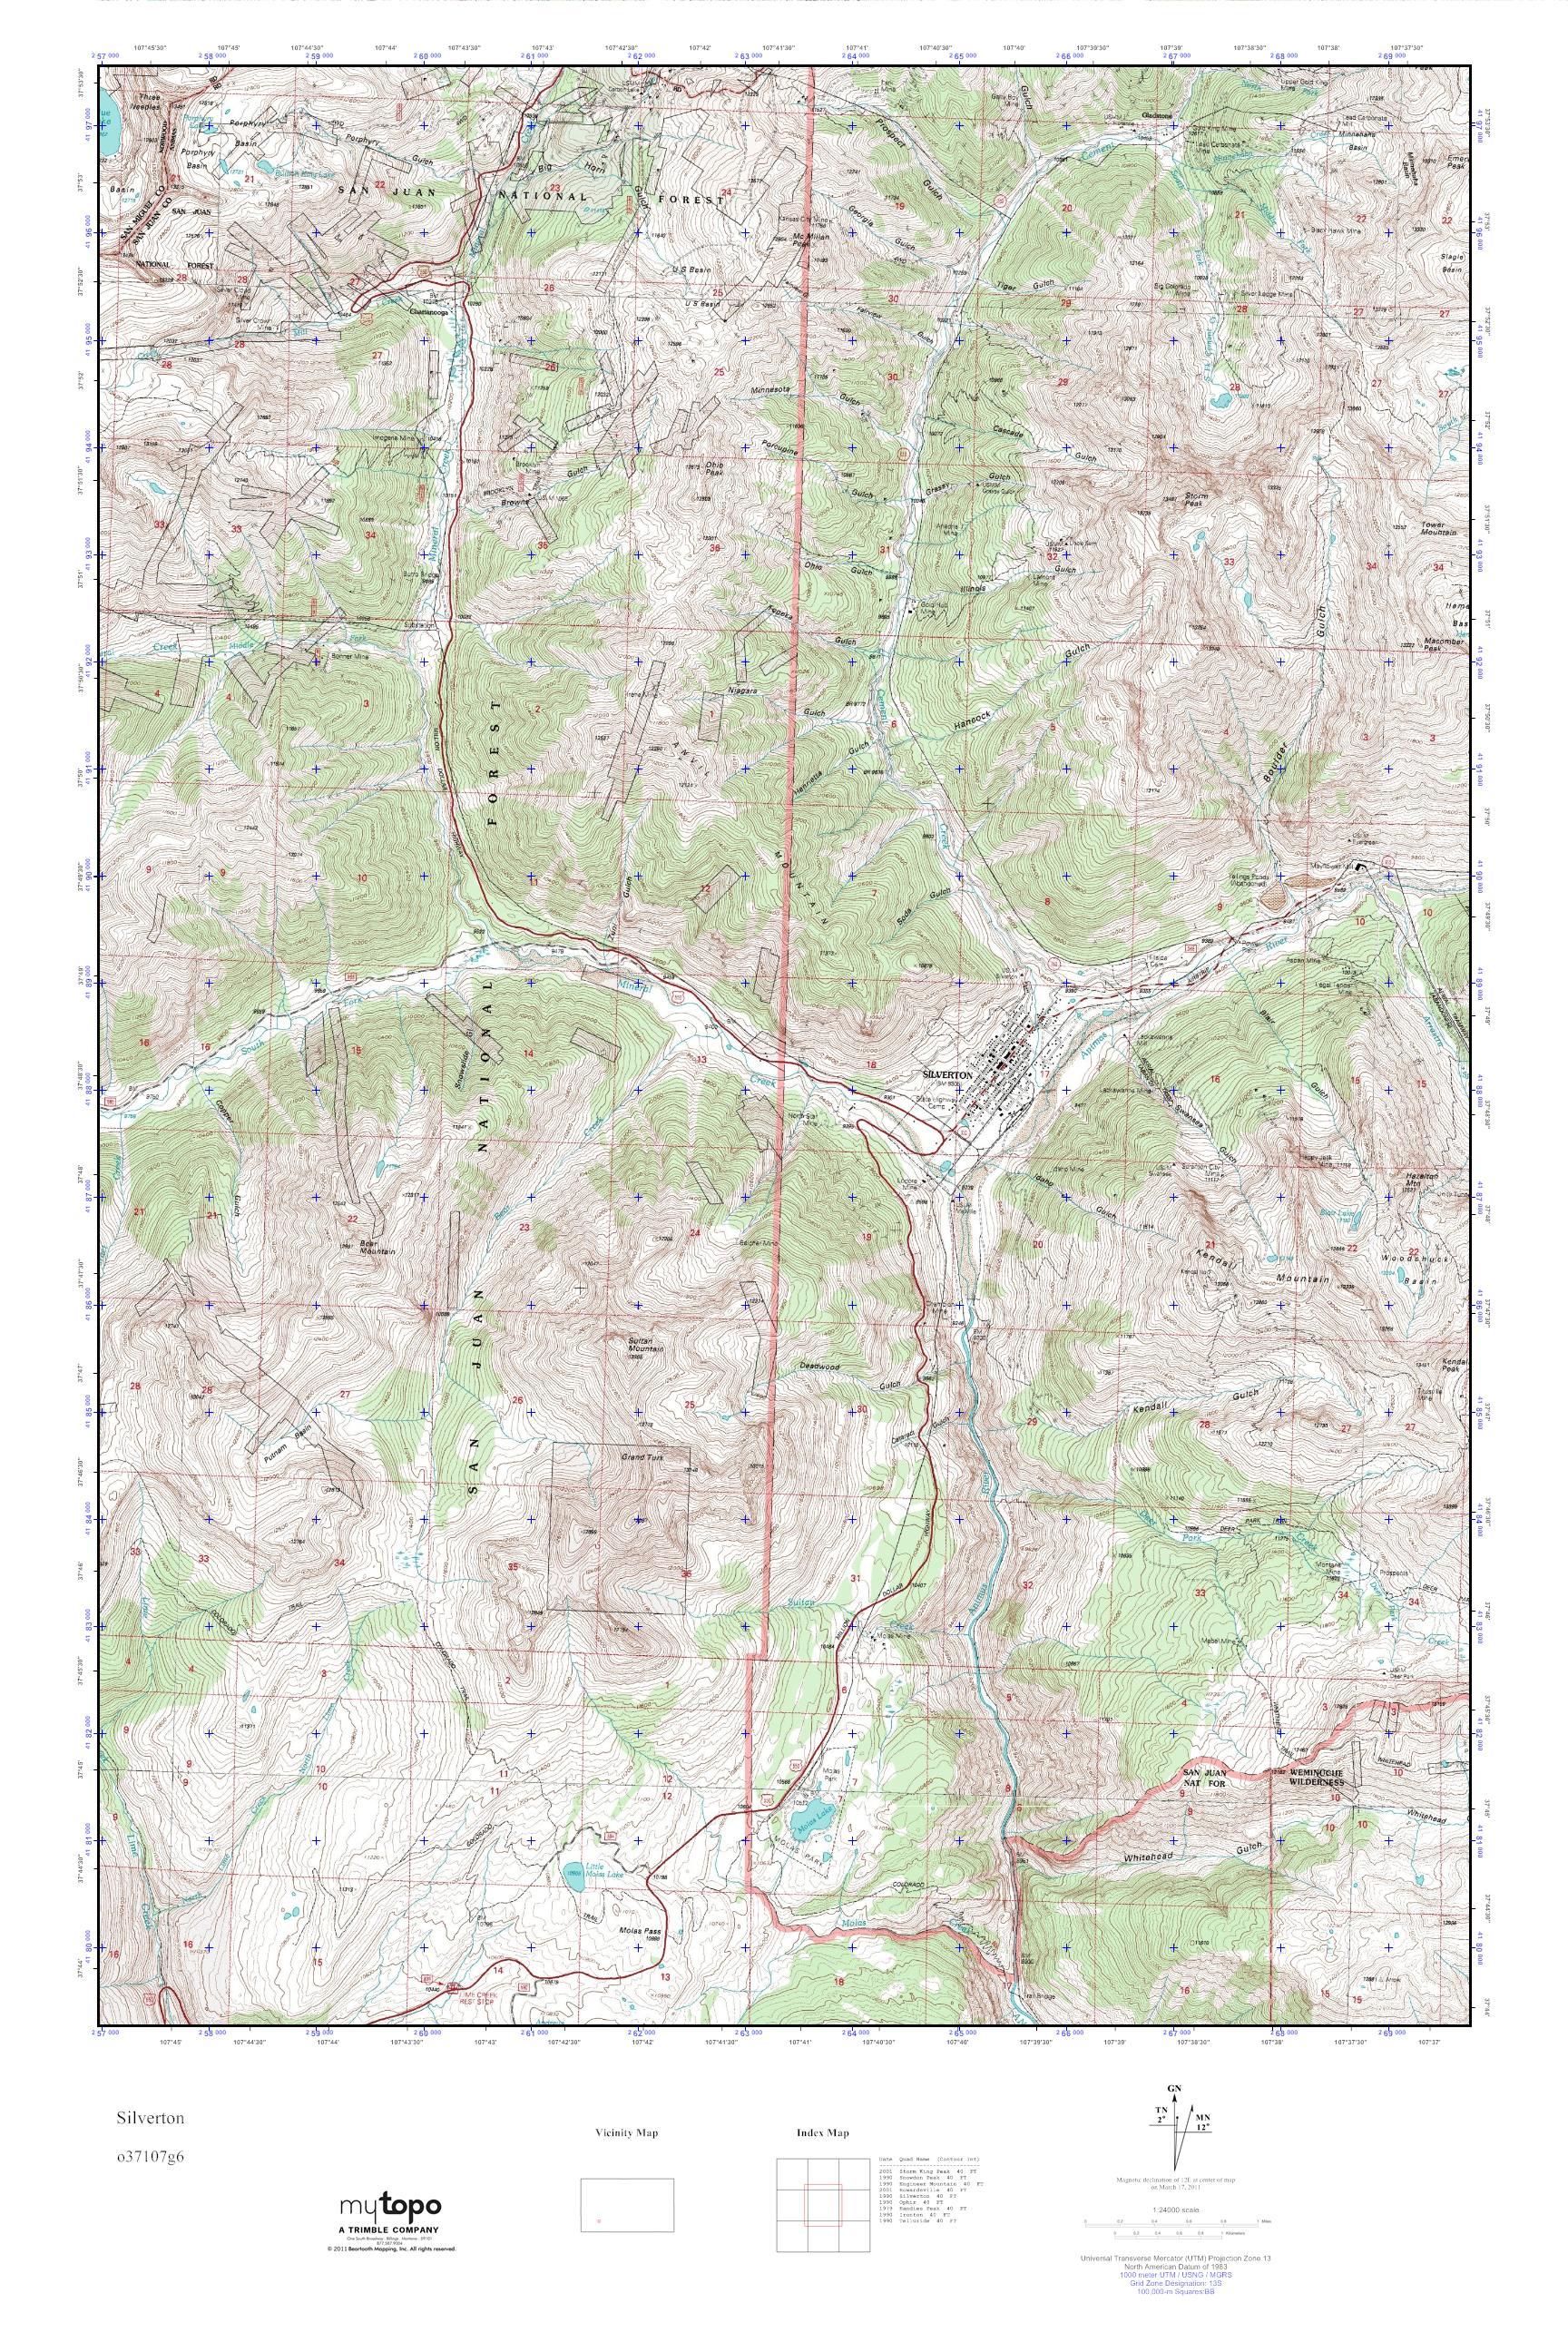 Mytopo Silverton Colorado Usgs Quad Topo Map